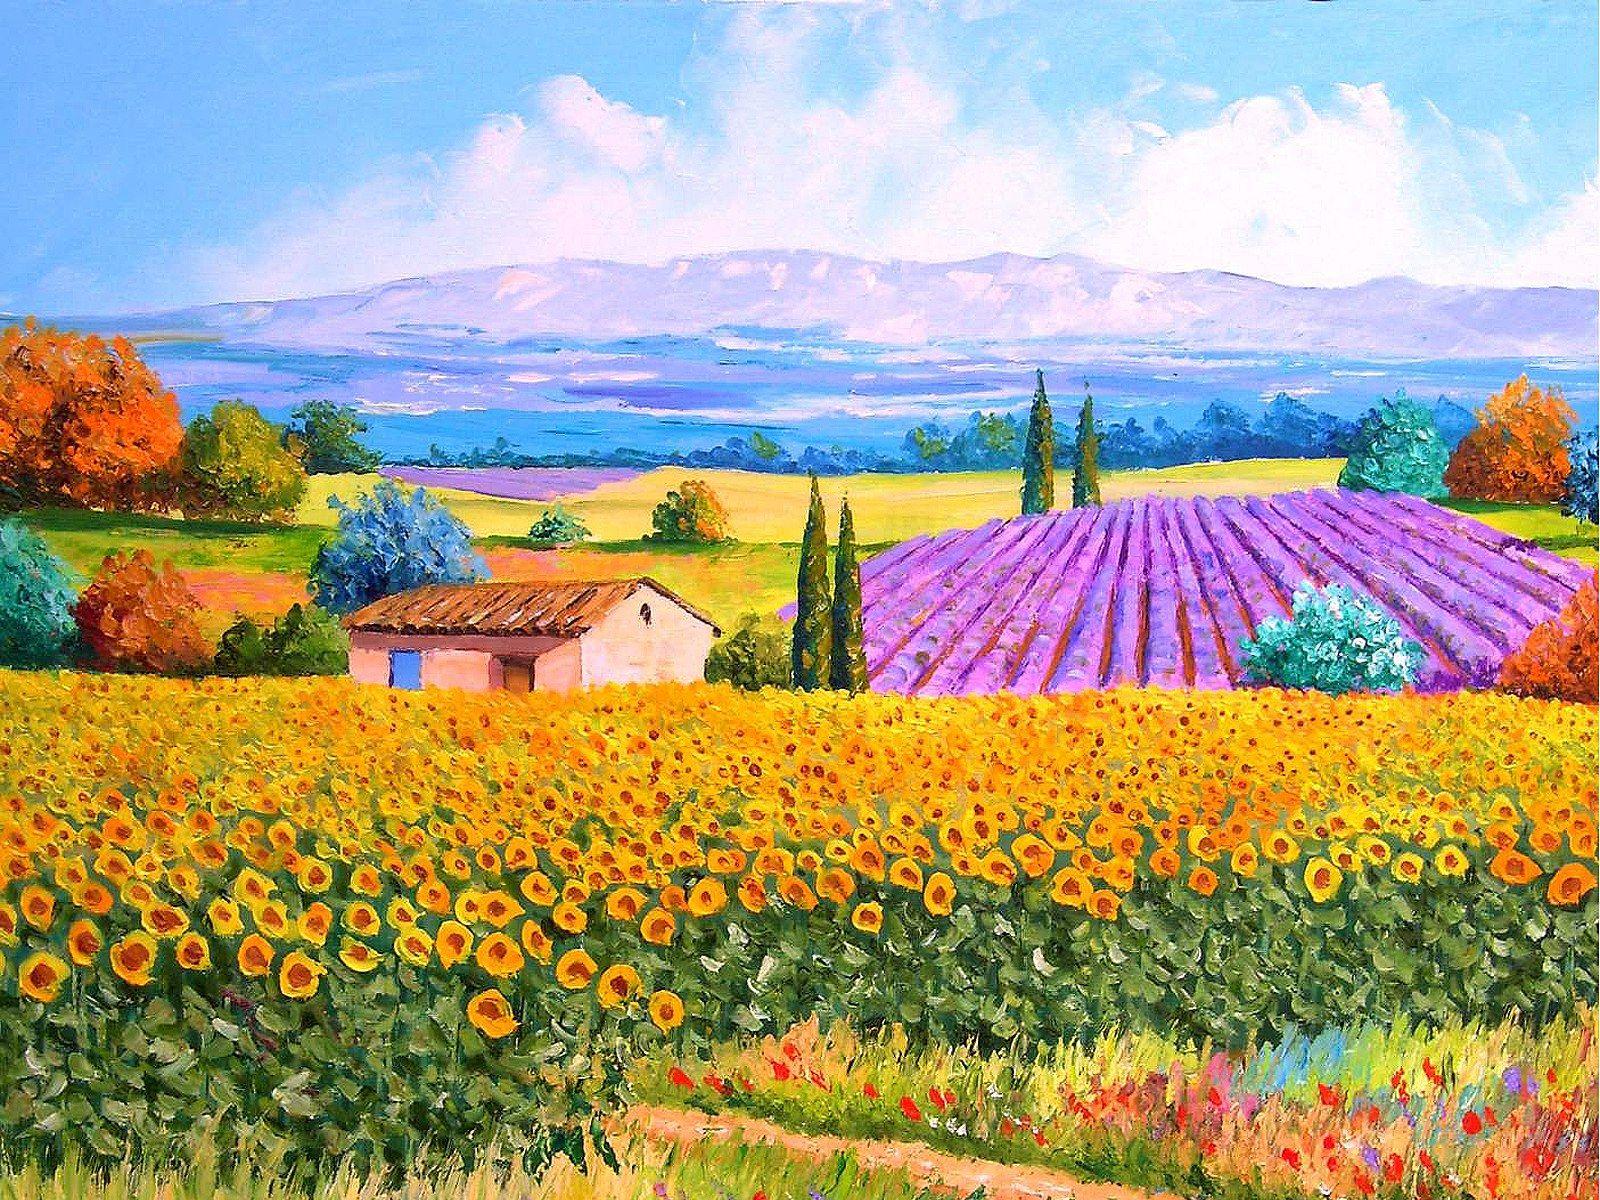 France Country Landscape Jean Marc Janiaczyk Landscape Painting With Palette Knife 1600x1200 No Landscape Paintings Oil Painting Landscape Colorful Landscape